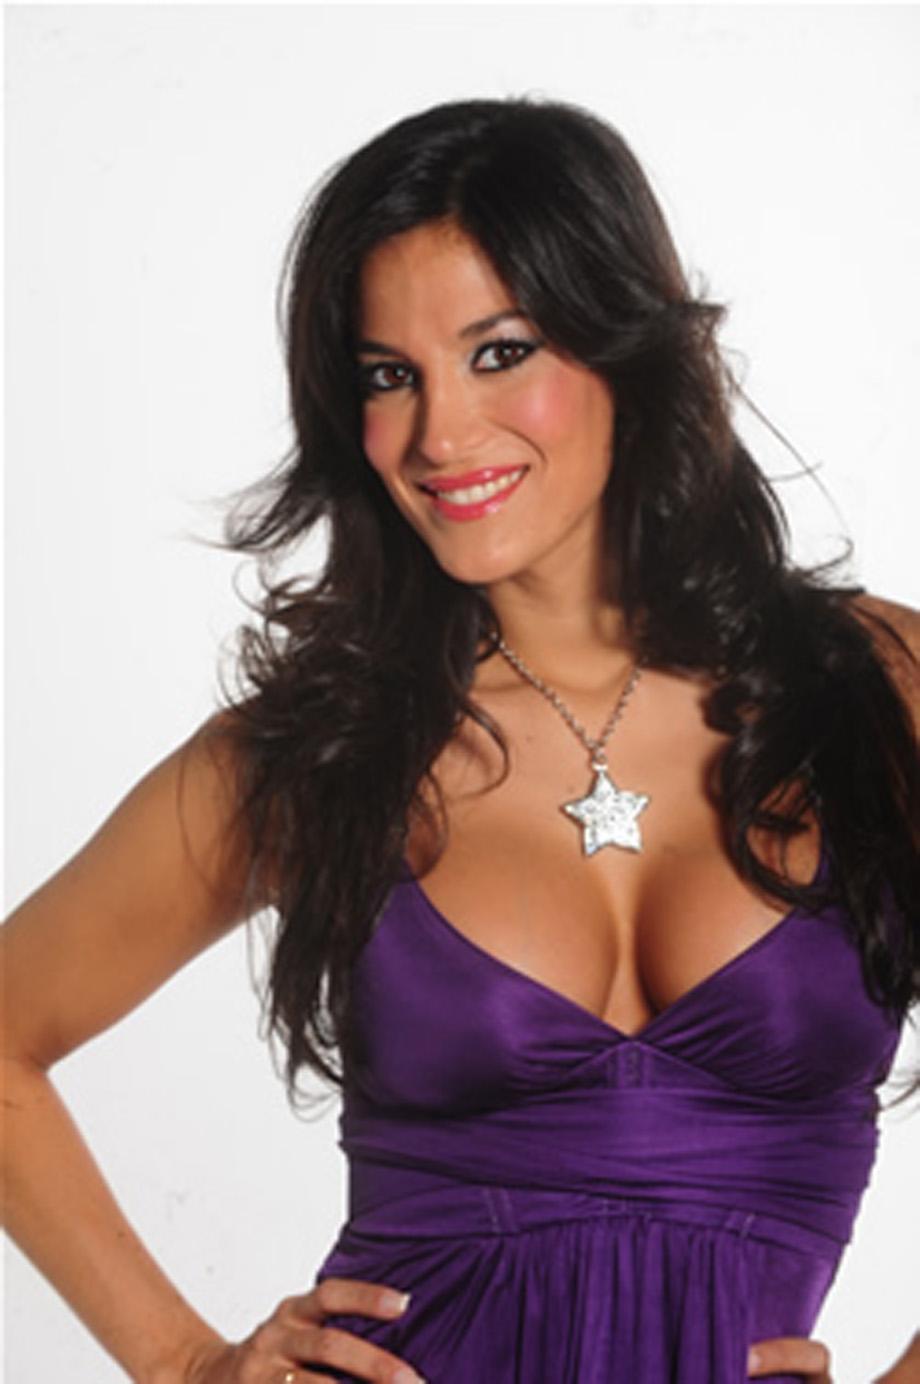 Rachel Escudero naked (79 foto) Paparazzi, Snapchat, cleavage